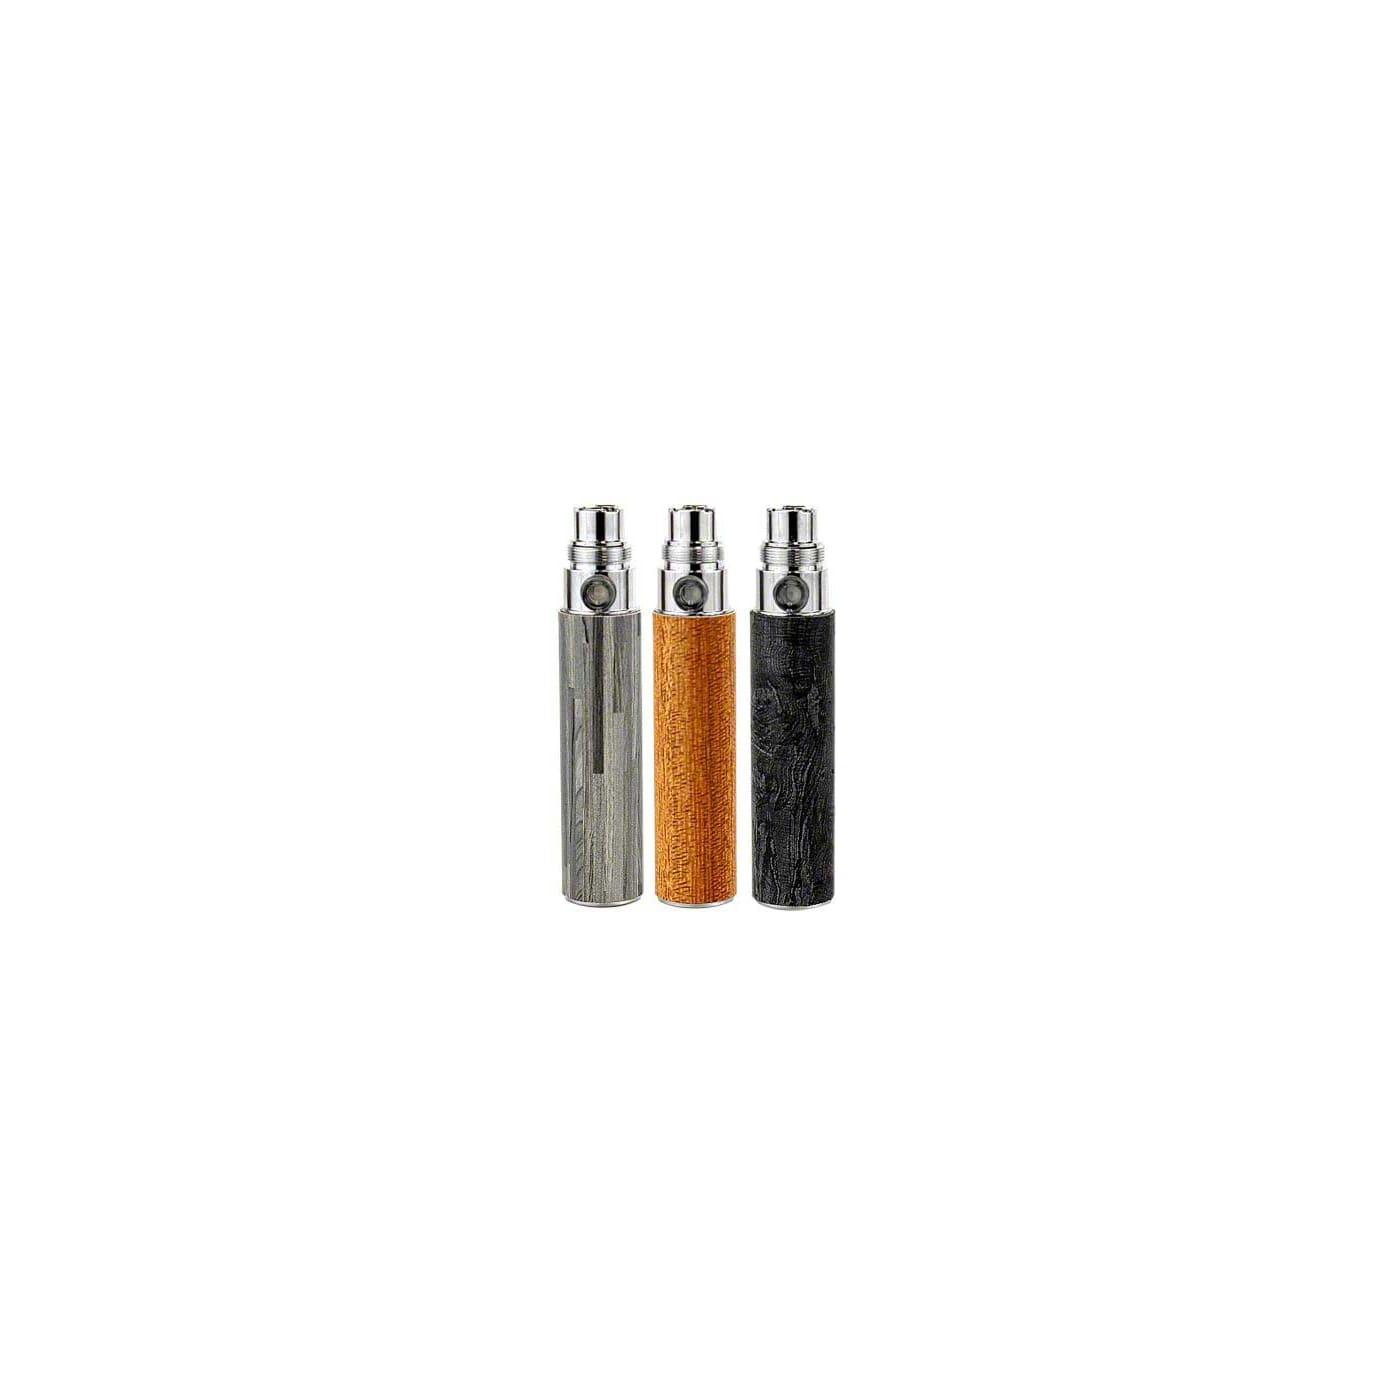 eGo Wood Style Battery 650 mAh Colors